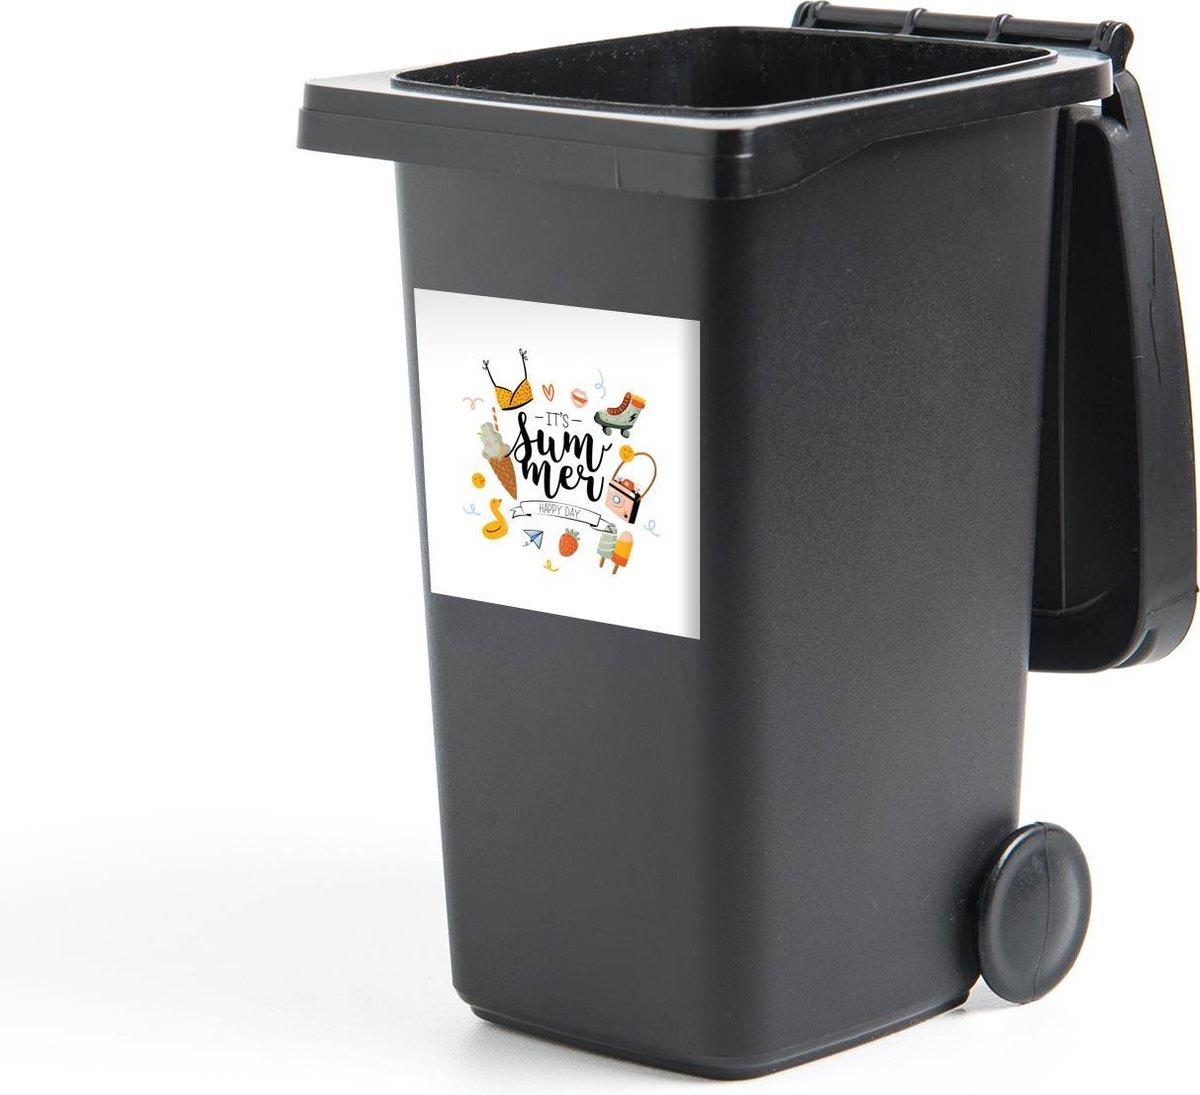 Container sticker Rolschaatsen - Zomer - Bikini - 40x40 cm - Kliko sticker